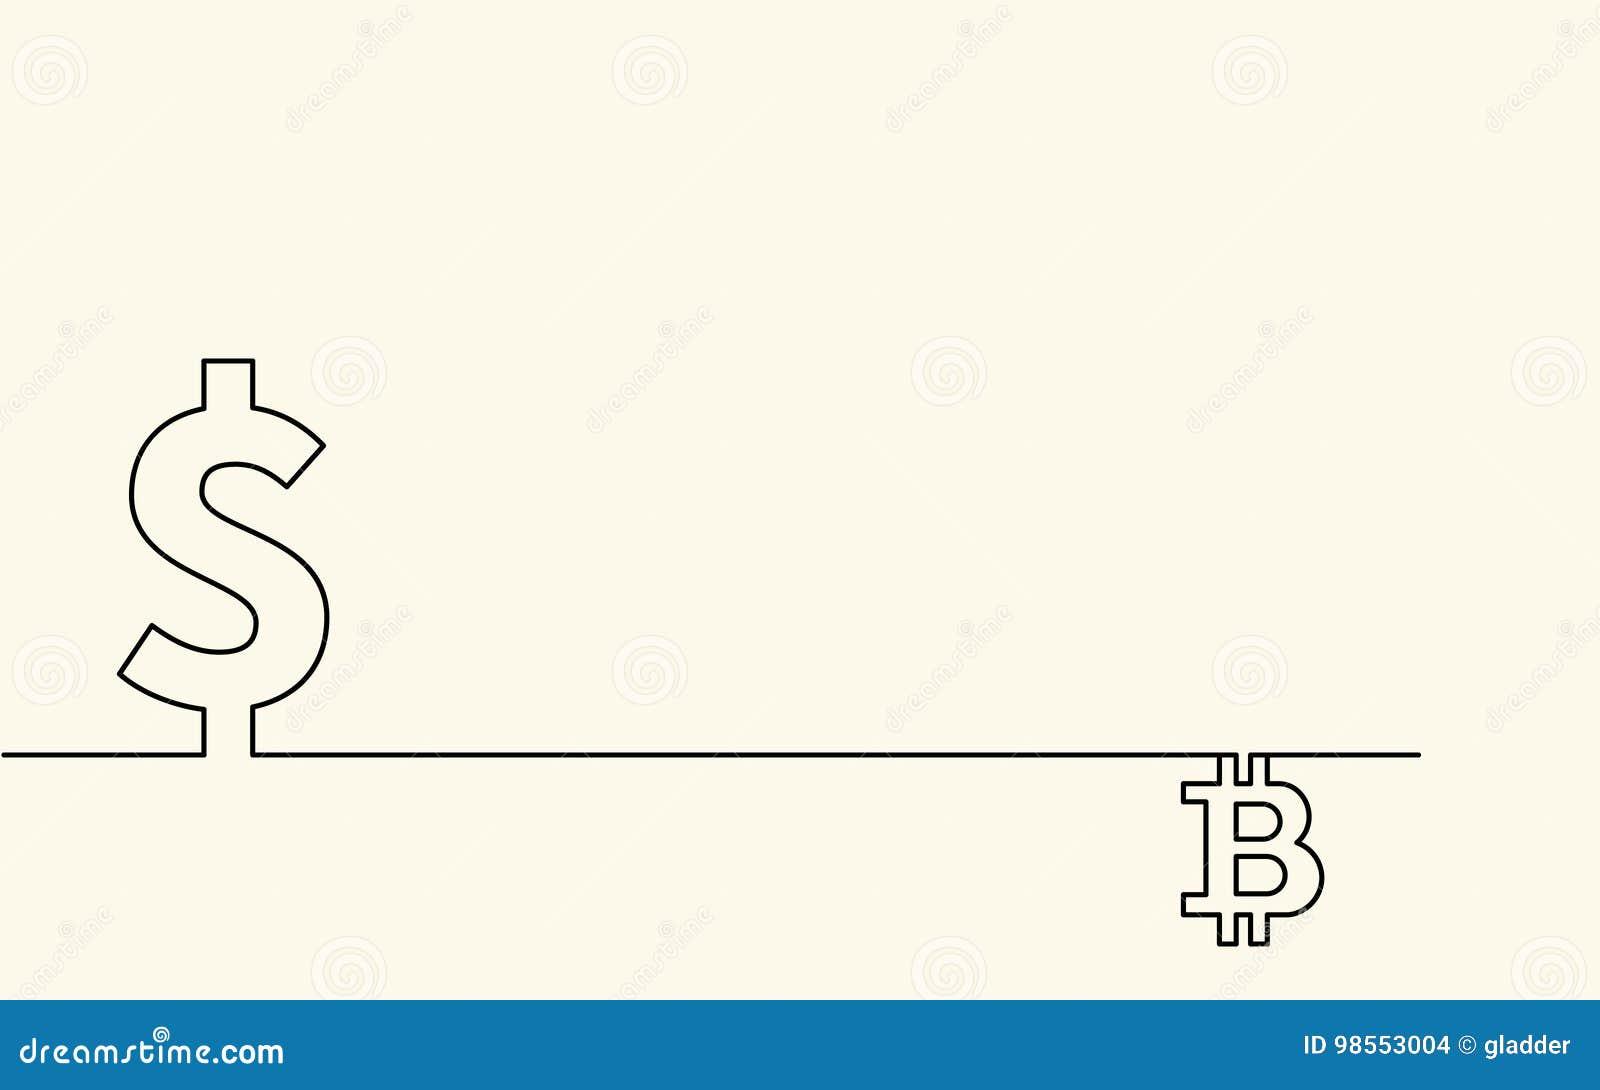 Symbol of currency dollar and symbol of digital crypto currency symbol of currency dollar and symbol of digital crypto currency bitcoin and currency symbol dollar in creative conceptual b buycottarizona